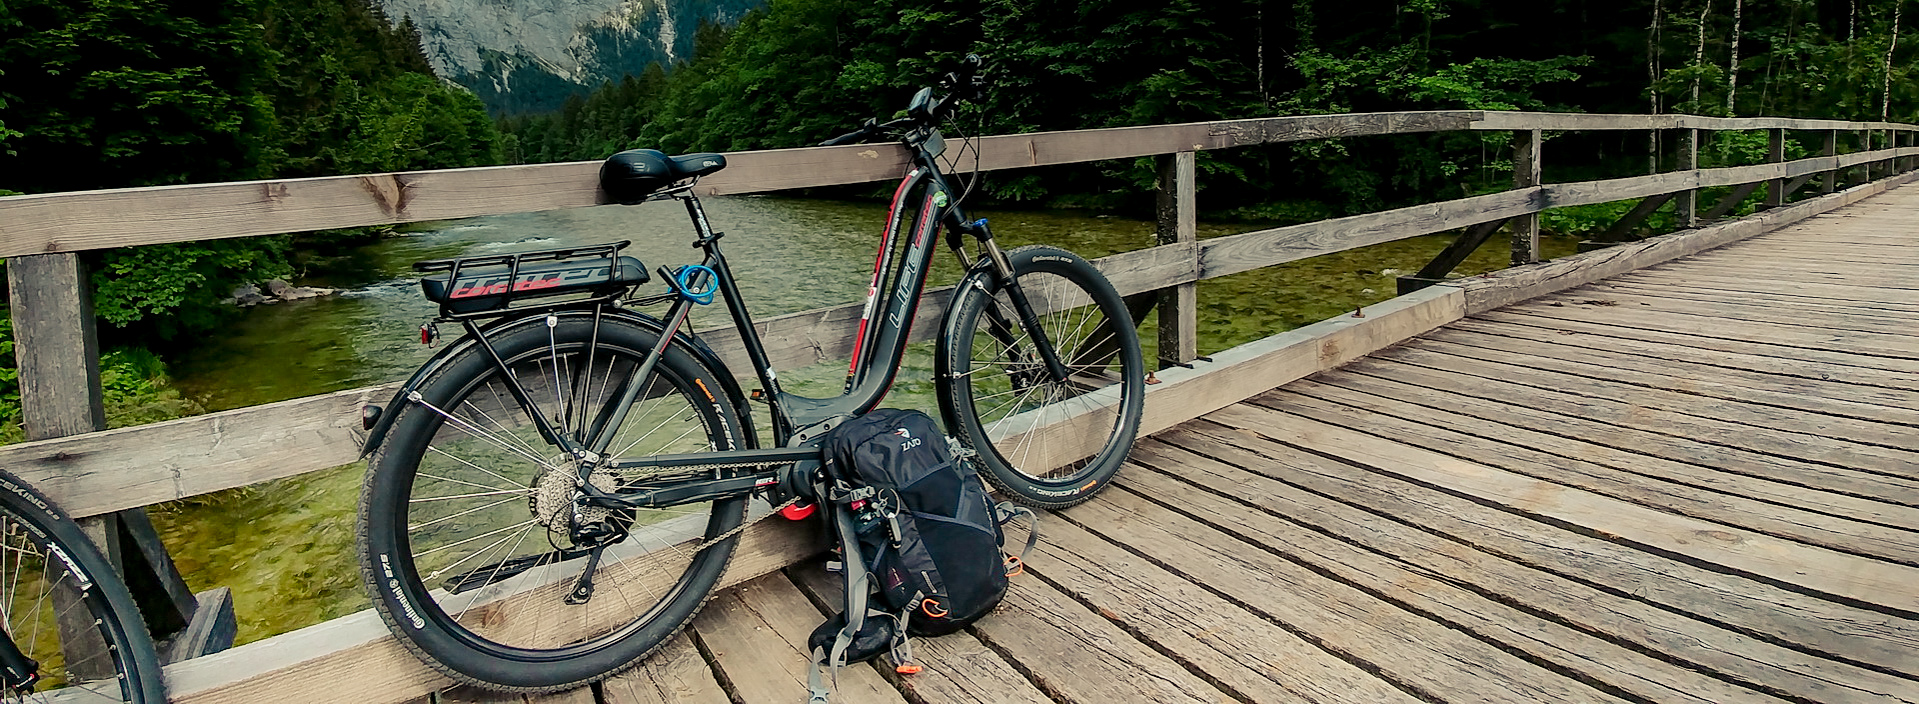 Elektromso bicikli bérlés Hallstatt